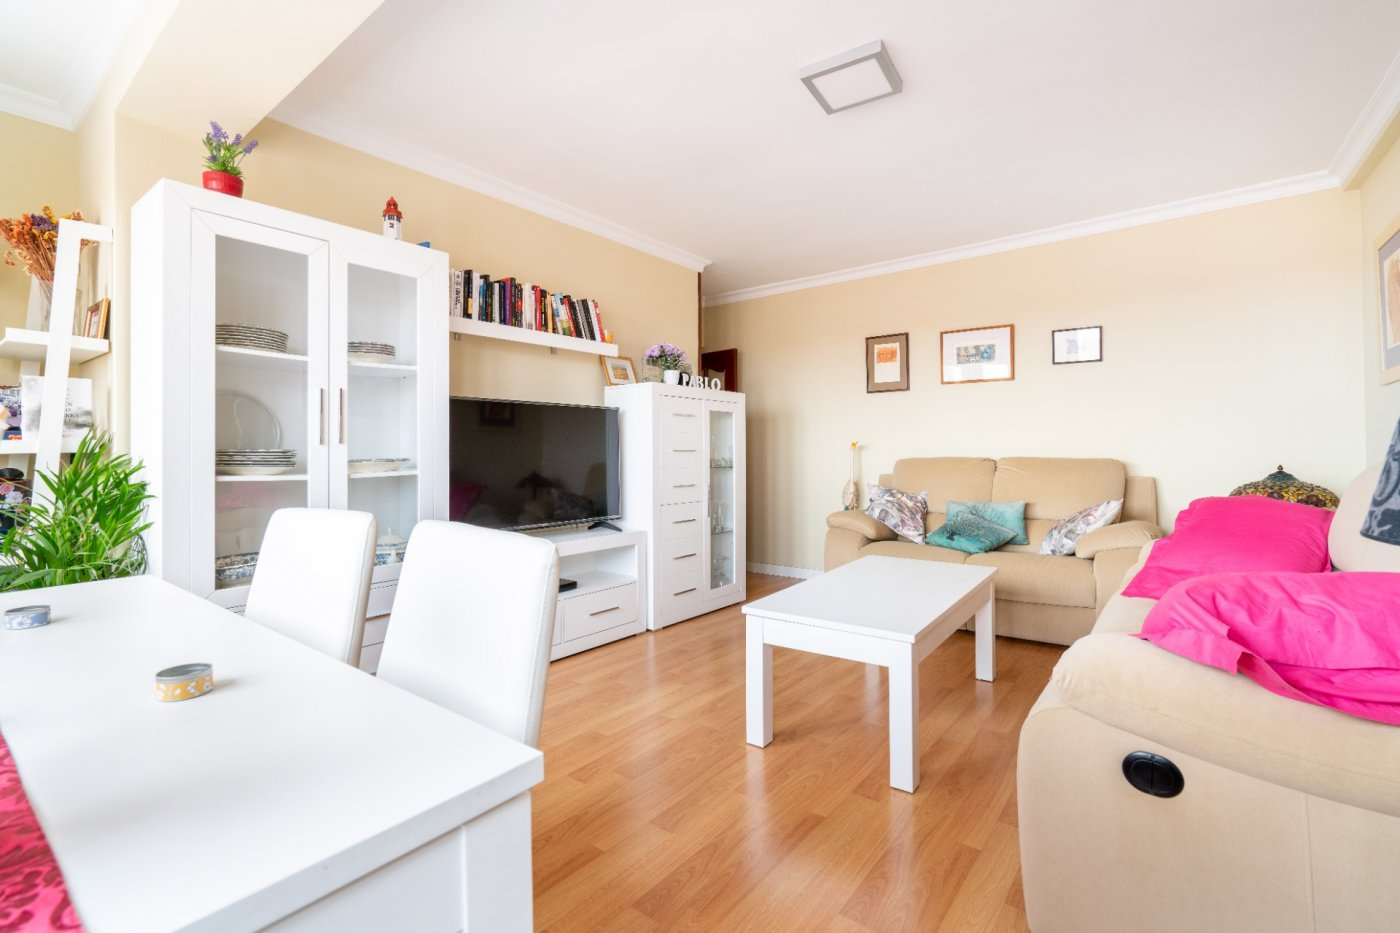 Flat for rent in Oliveros, Almeria